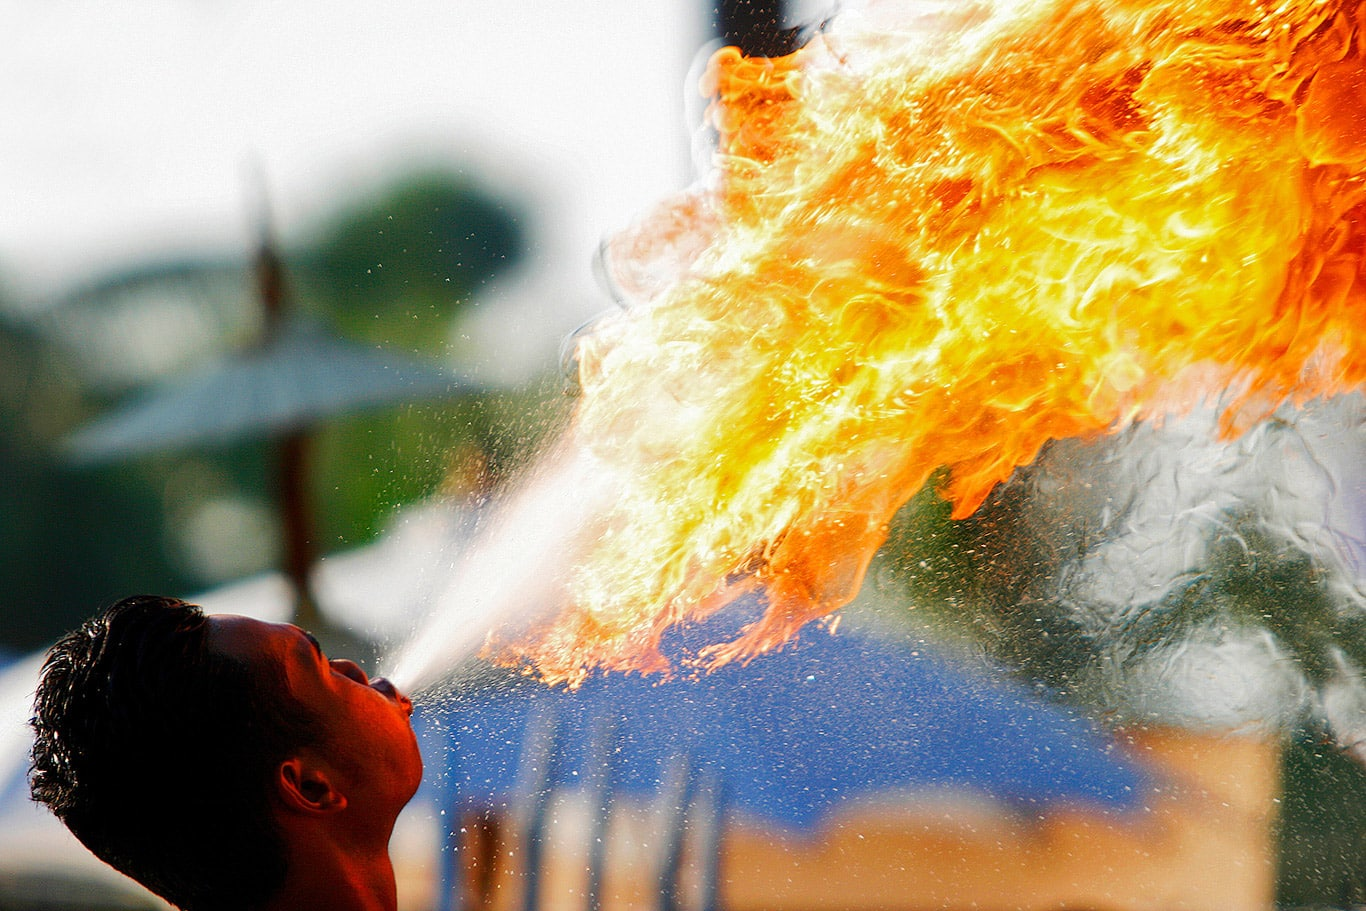 Fire breathing in Sukhothai, Thailand